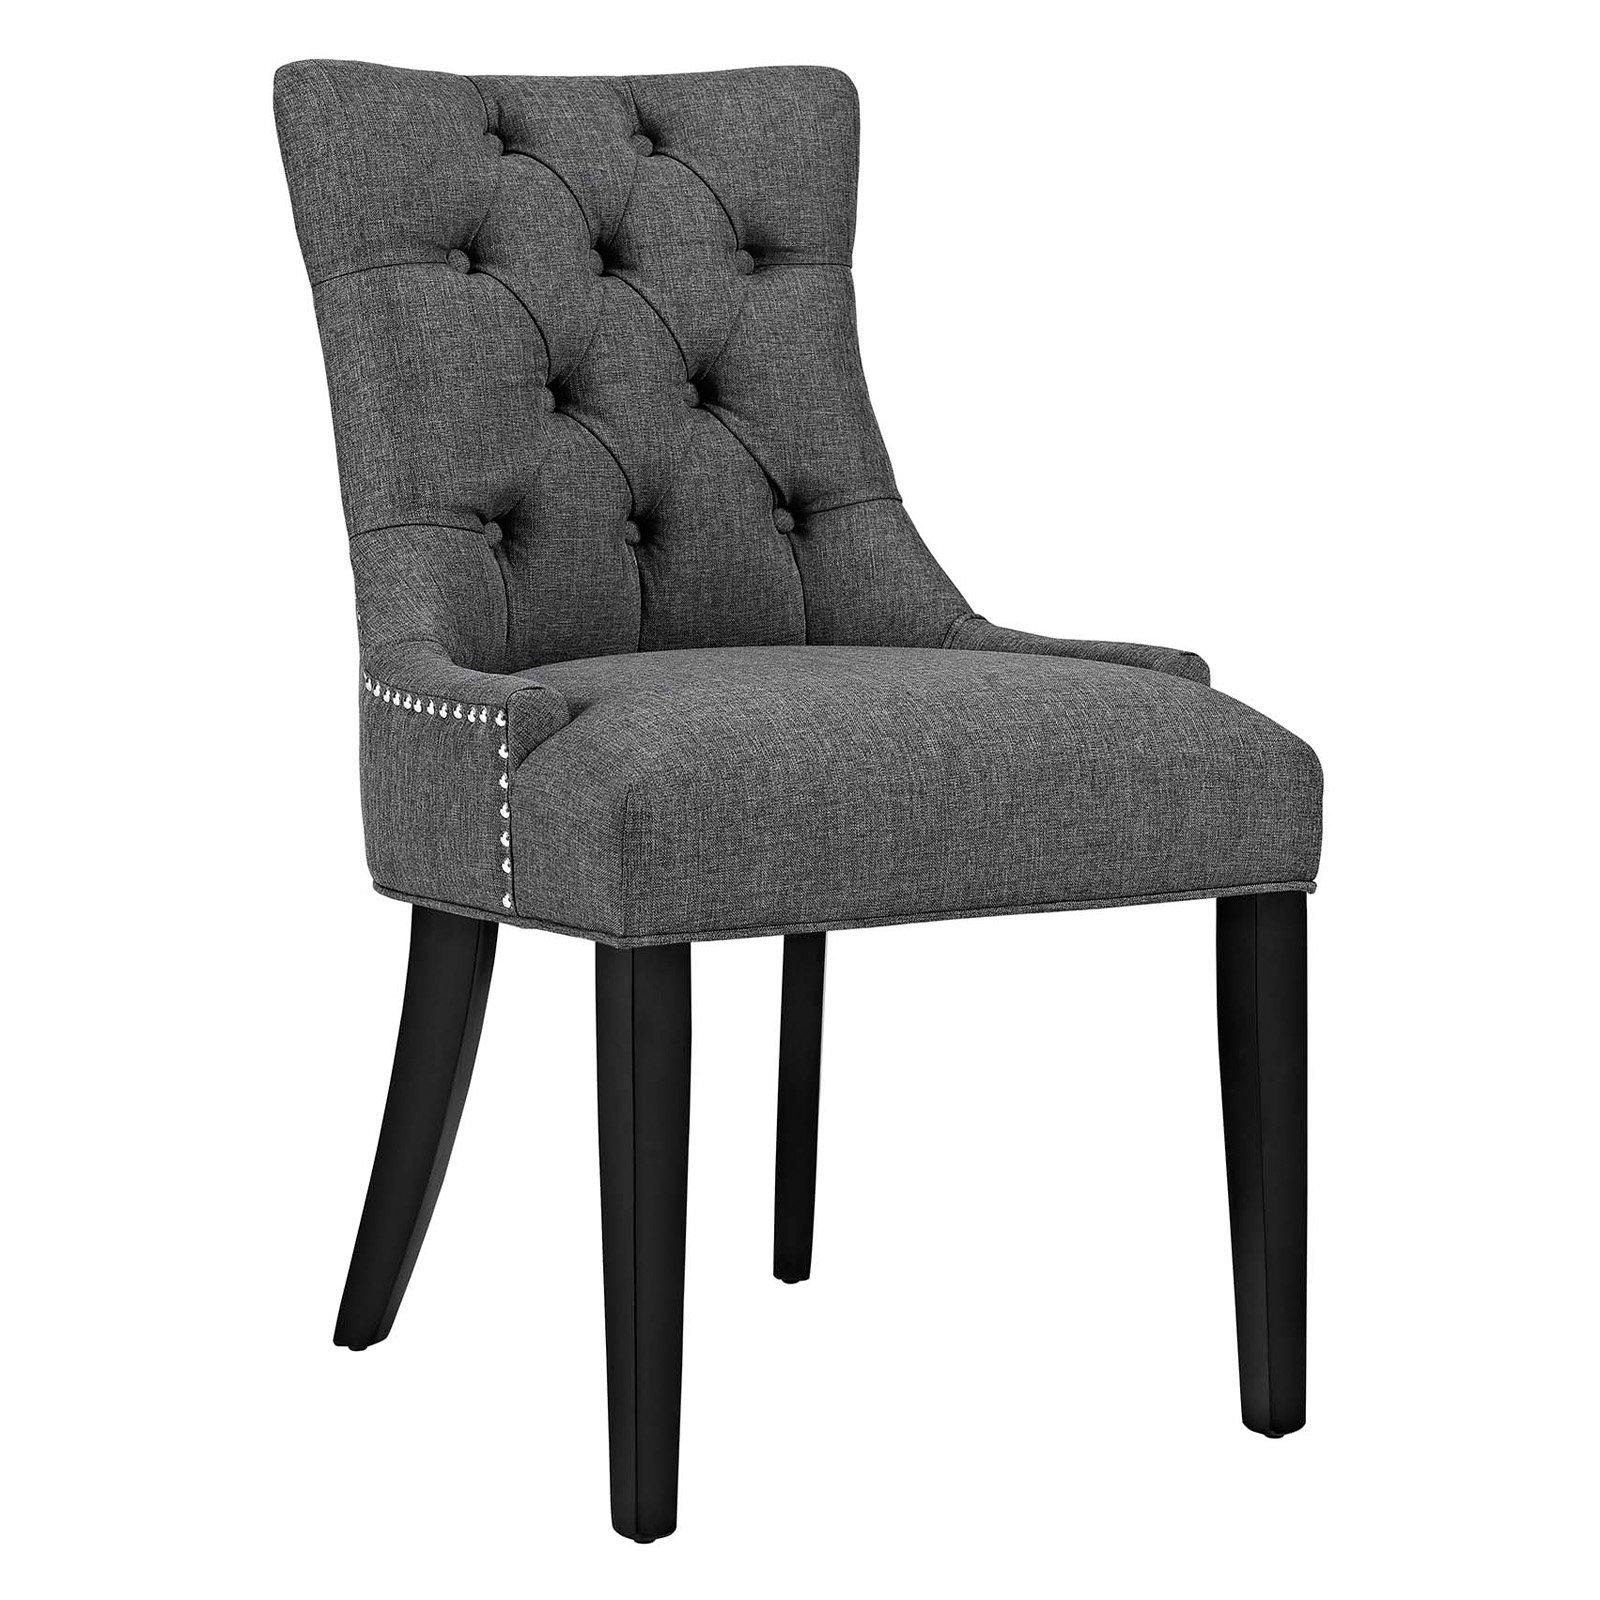 Modway Regent Upholstered Dining Chair, Multiple Colors - Walmart.com